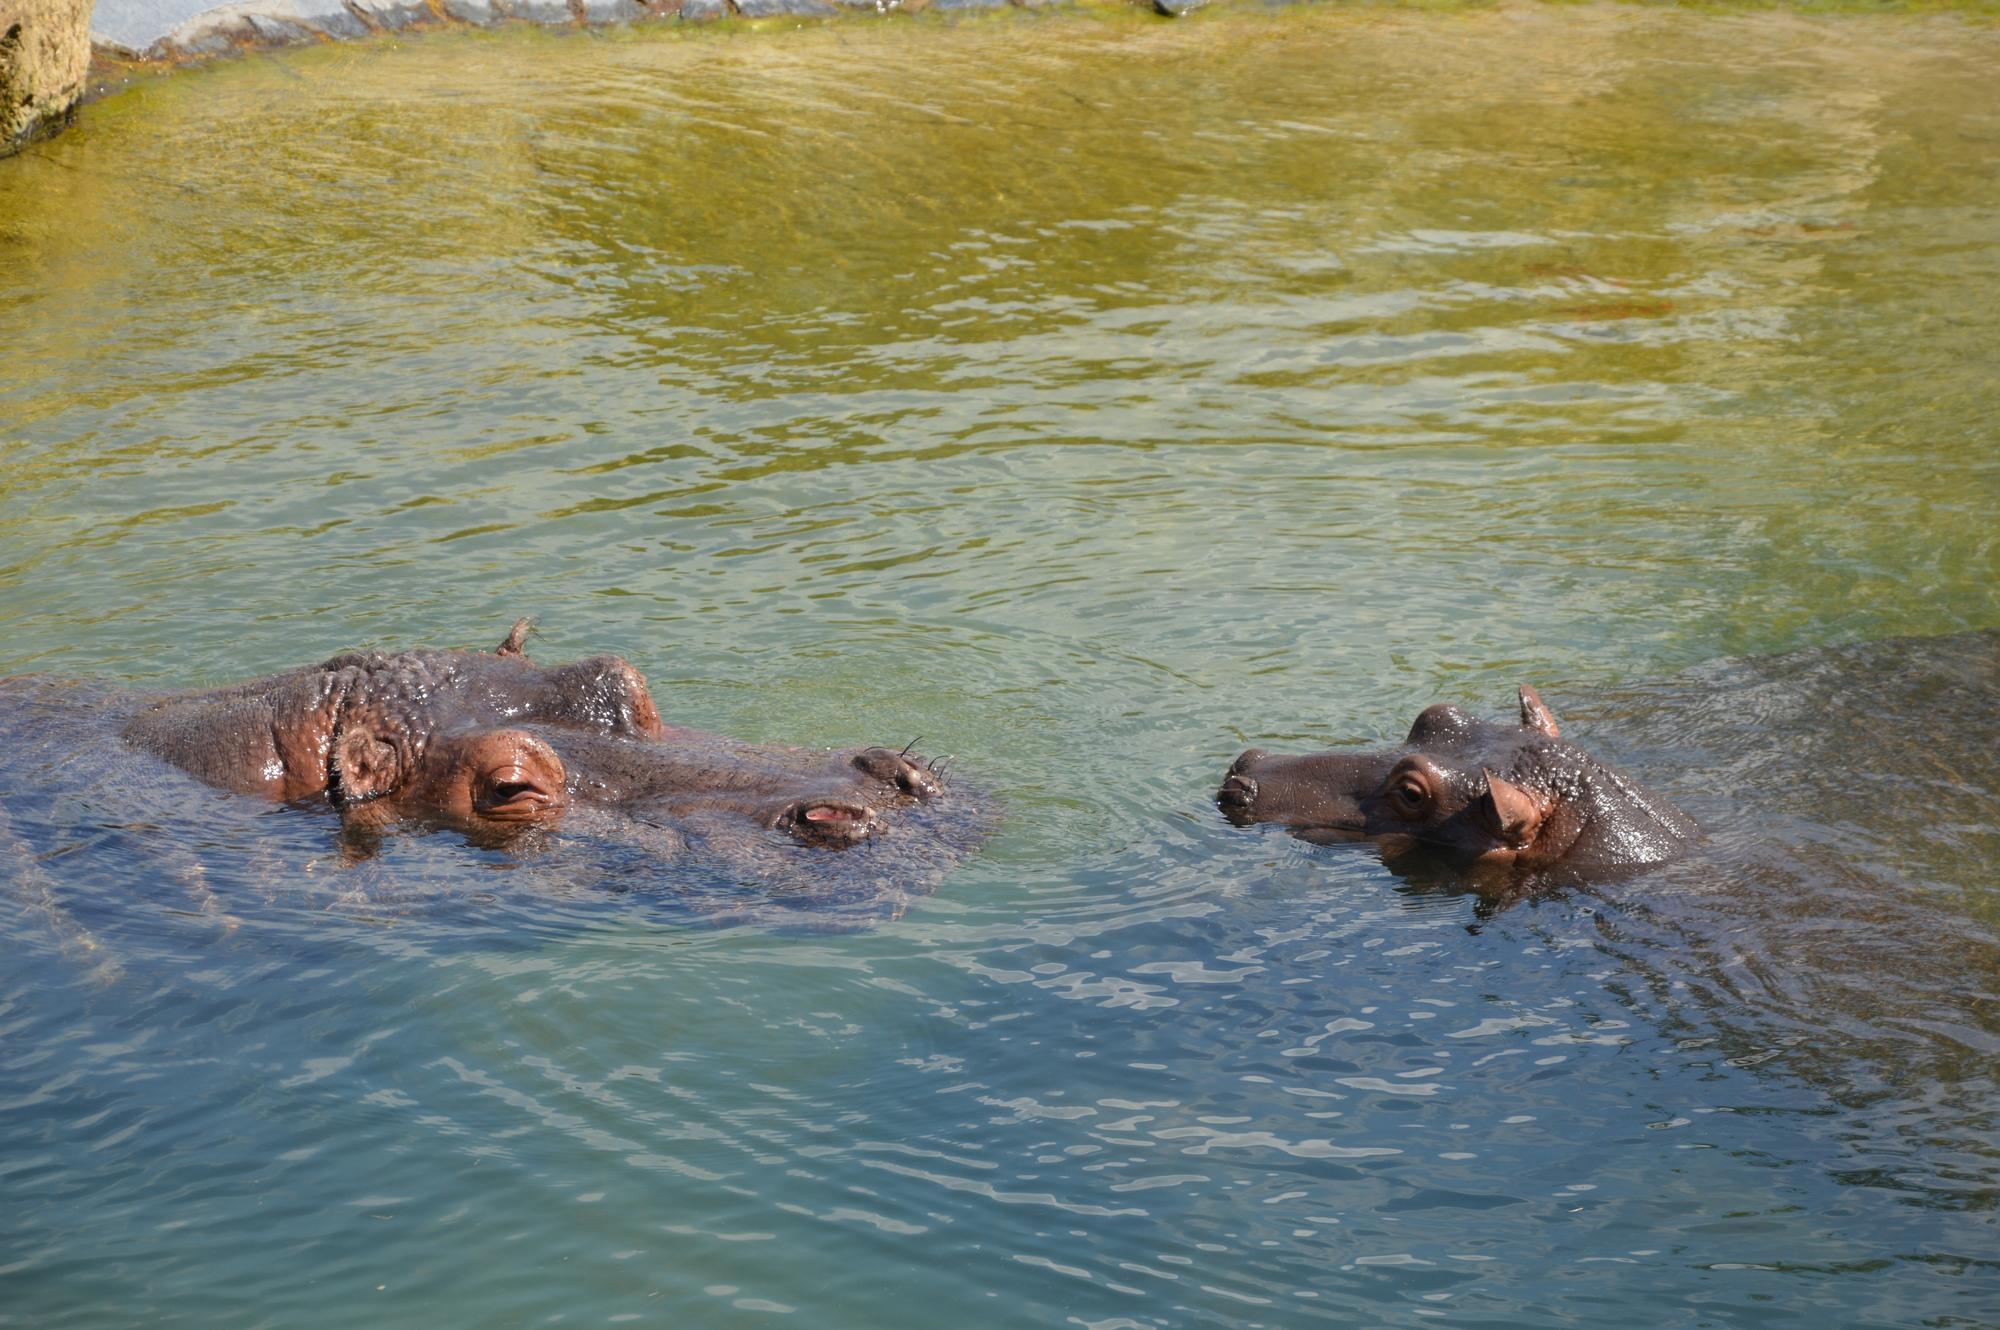 hippopotames-dans-leau-bebe-et-adulte-pairi-daiza